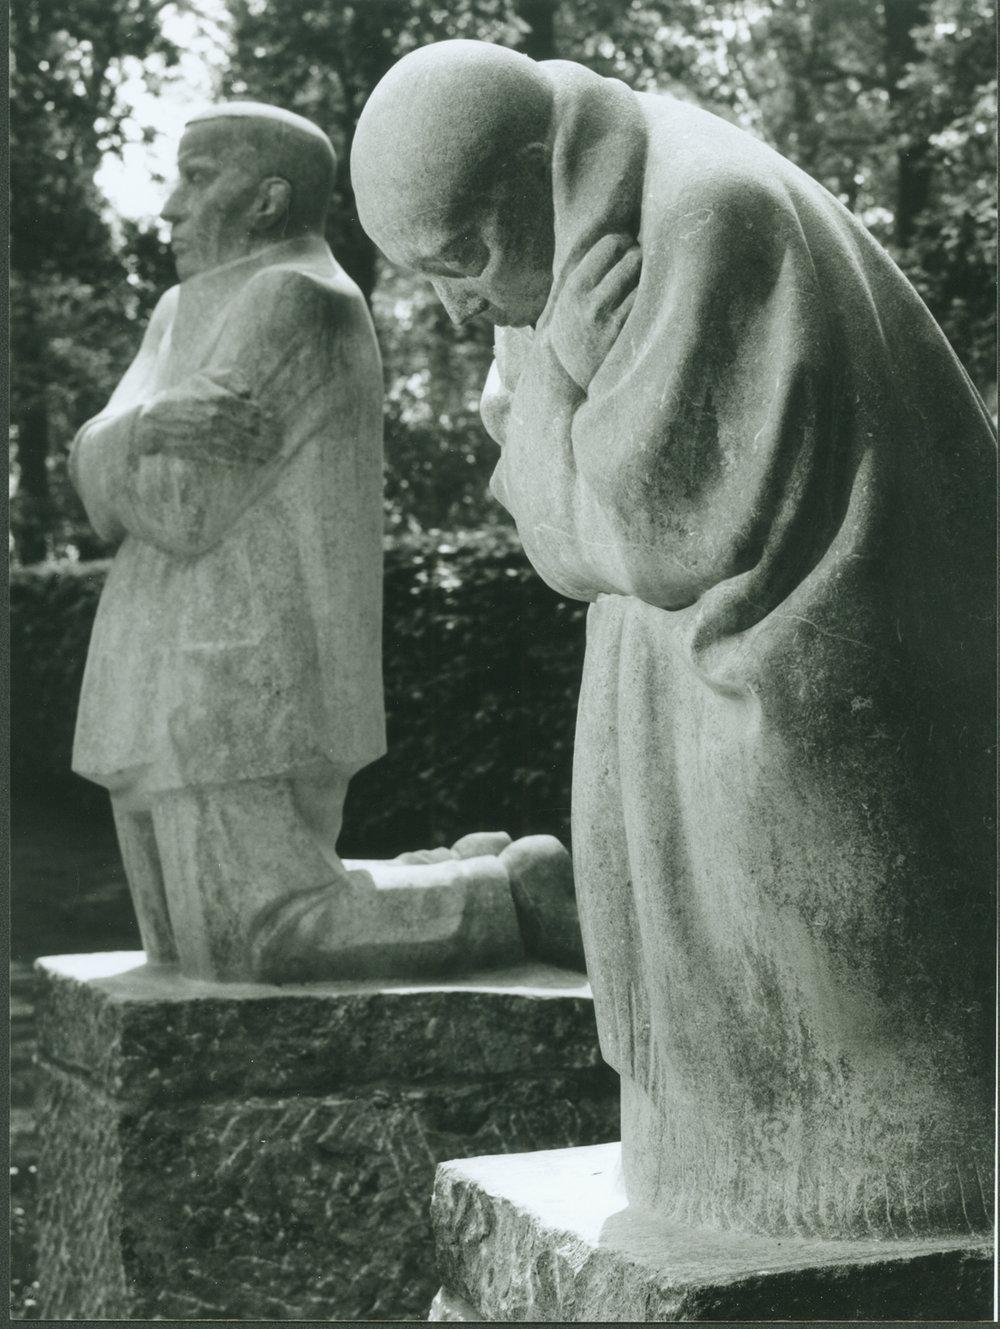 Käthe Kollwitz, Trauernde Eltern (Grieving Parents)